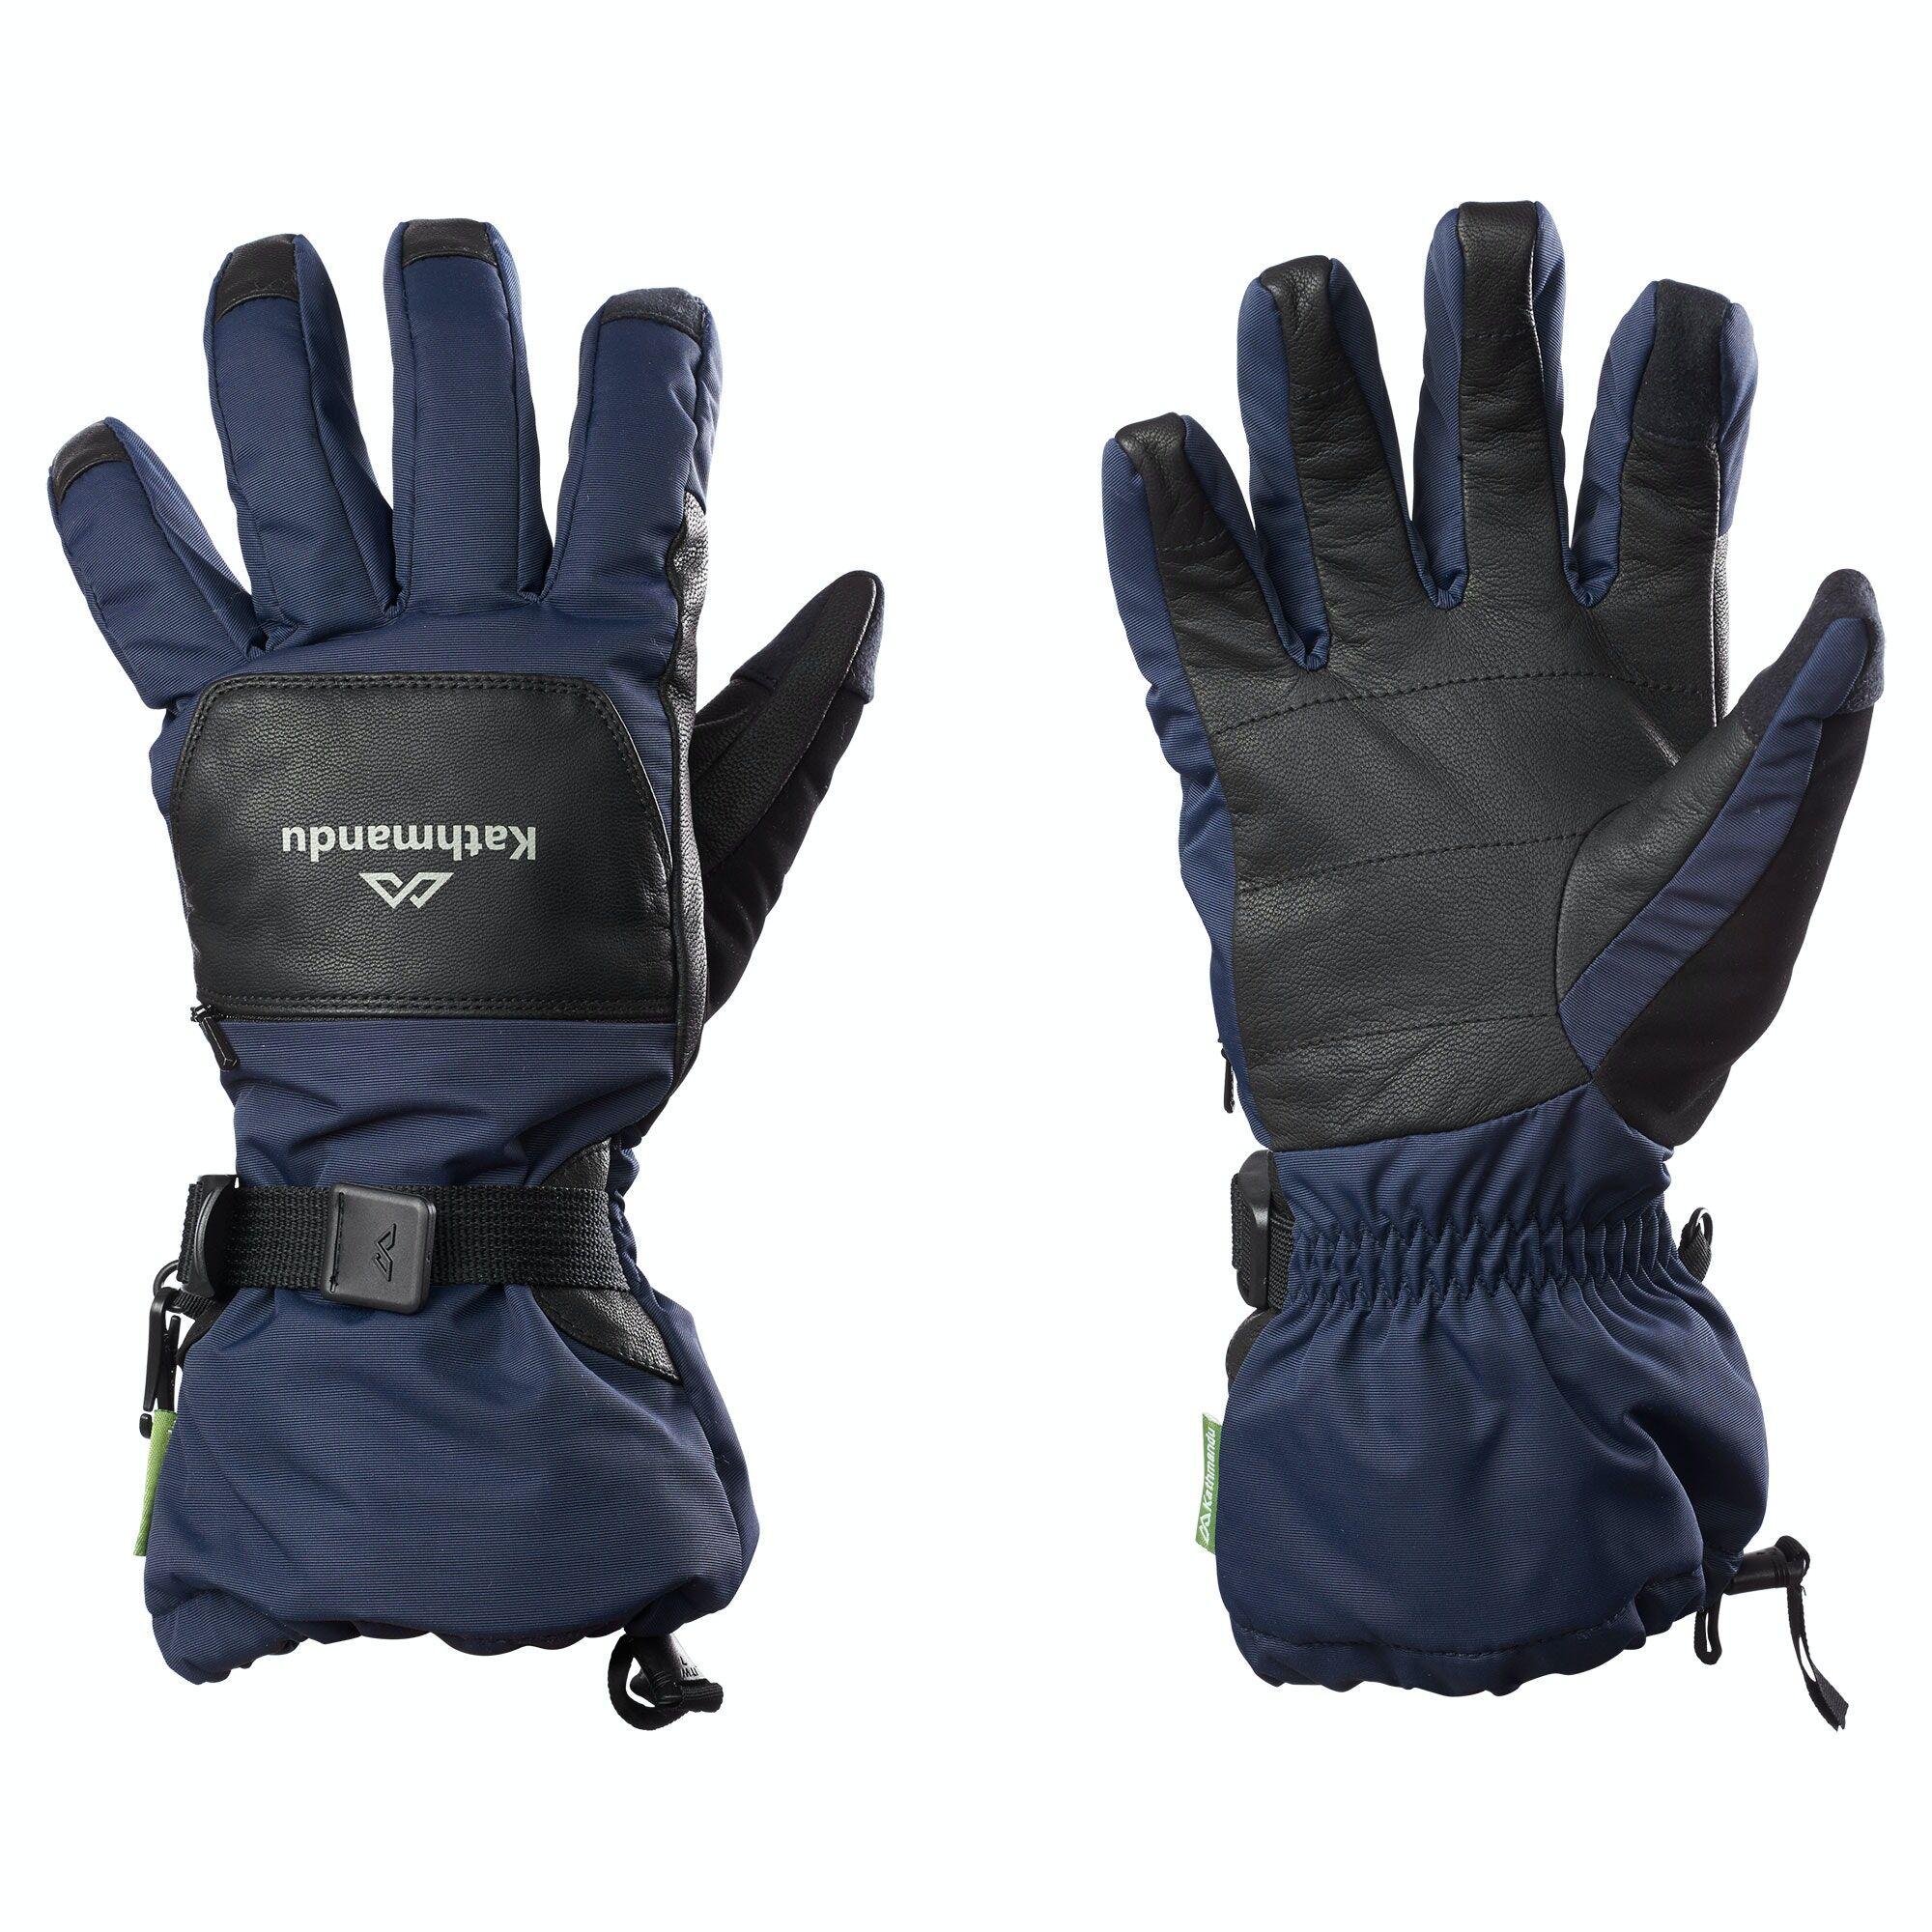 Kathmandu Snow Sports Gloves  - Dark Navy - Size: Large